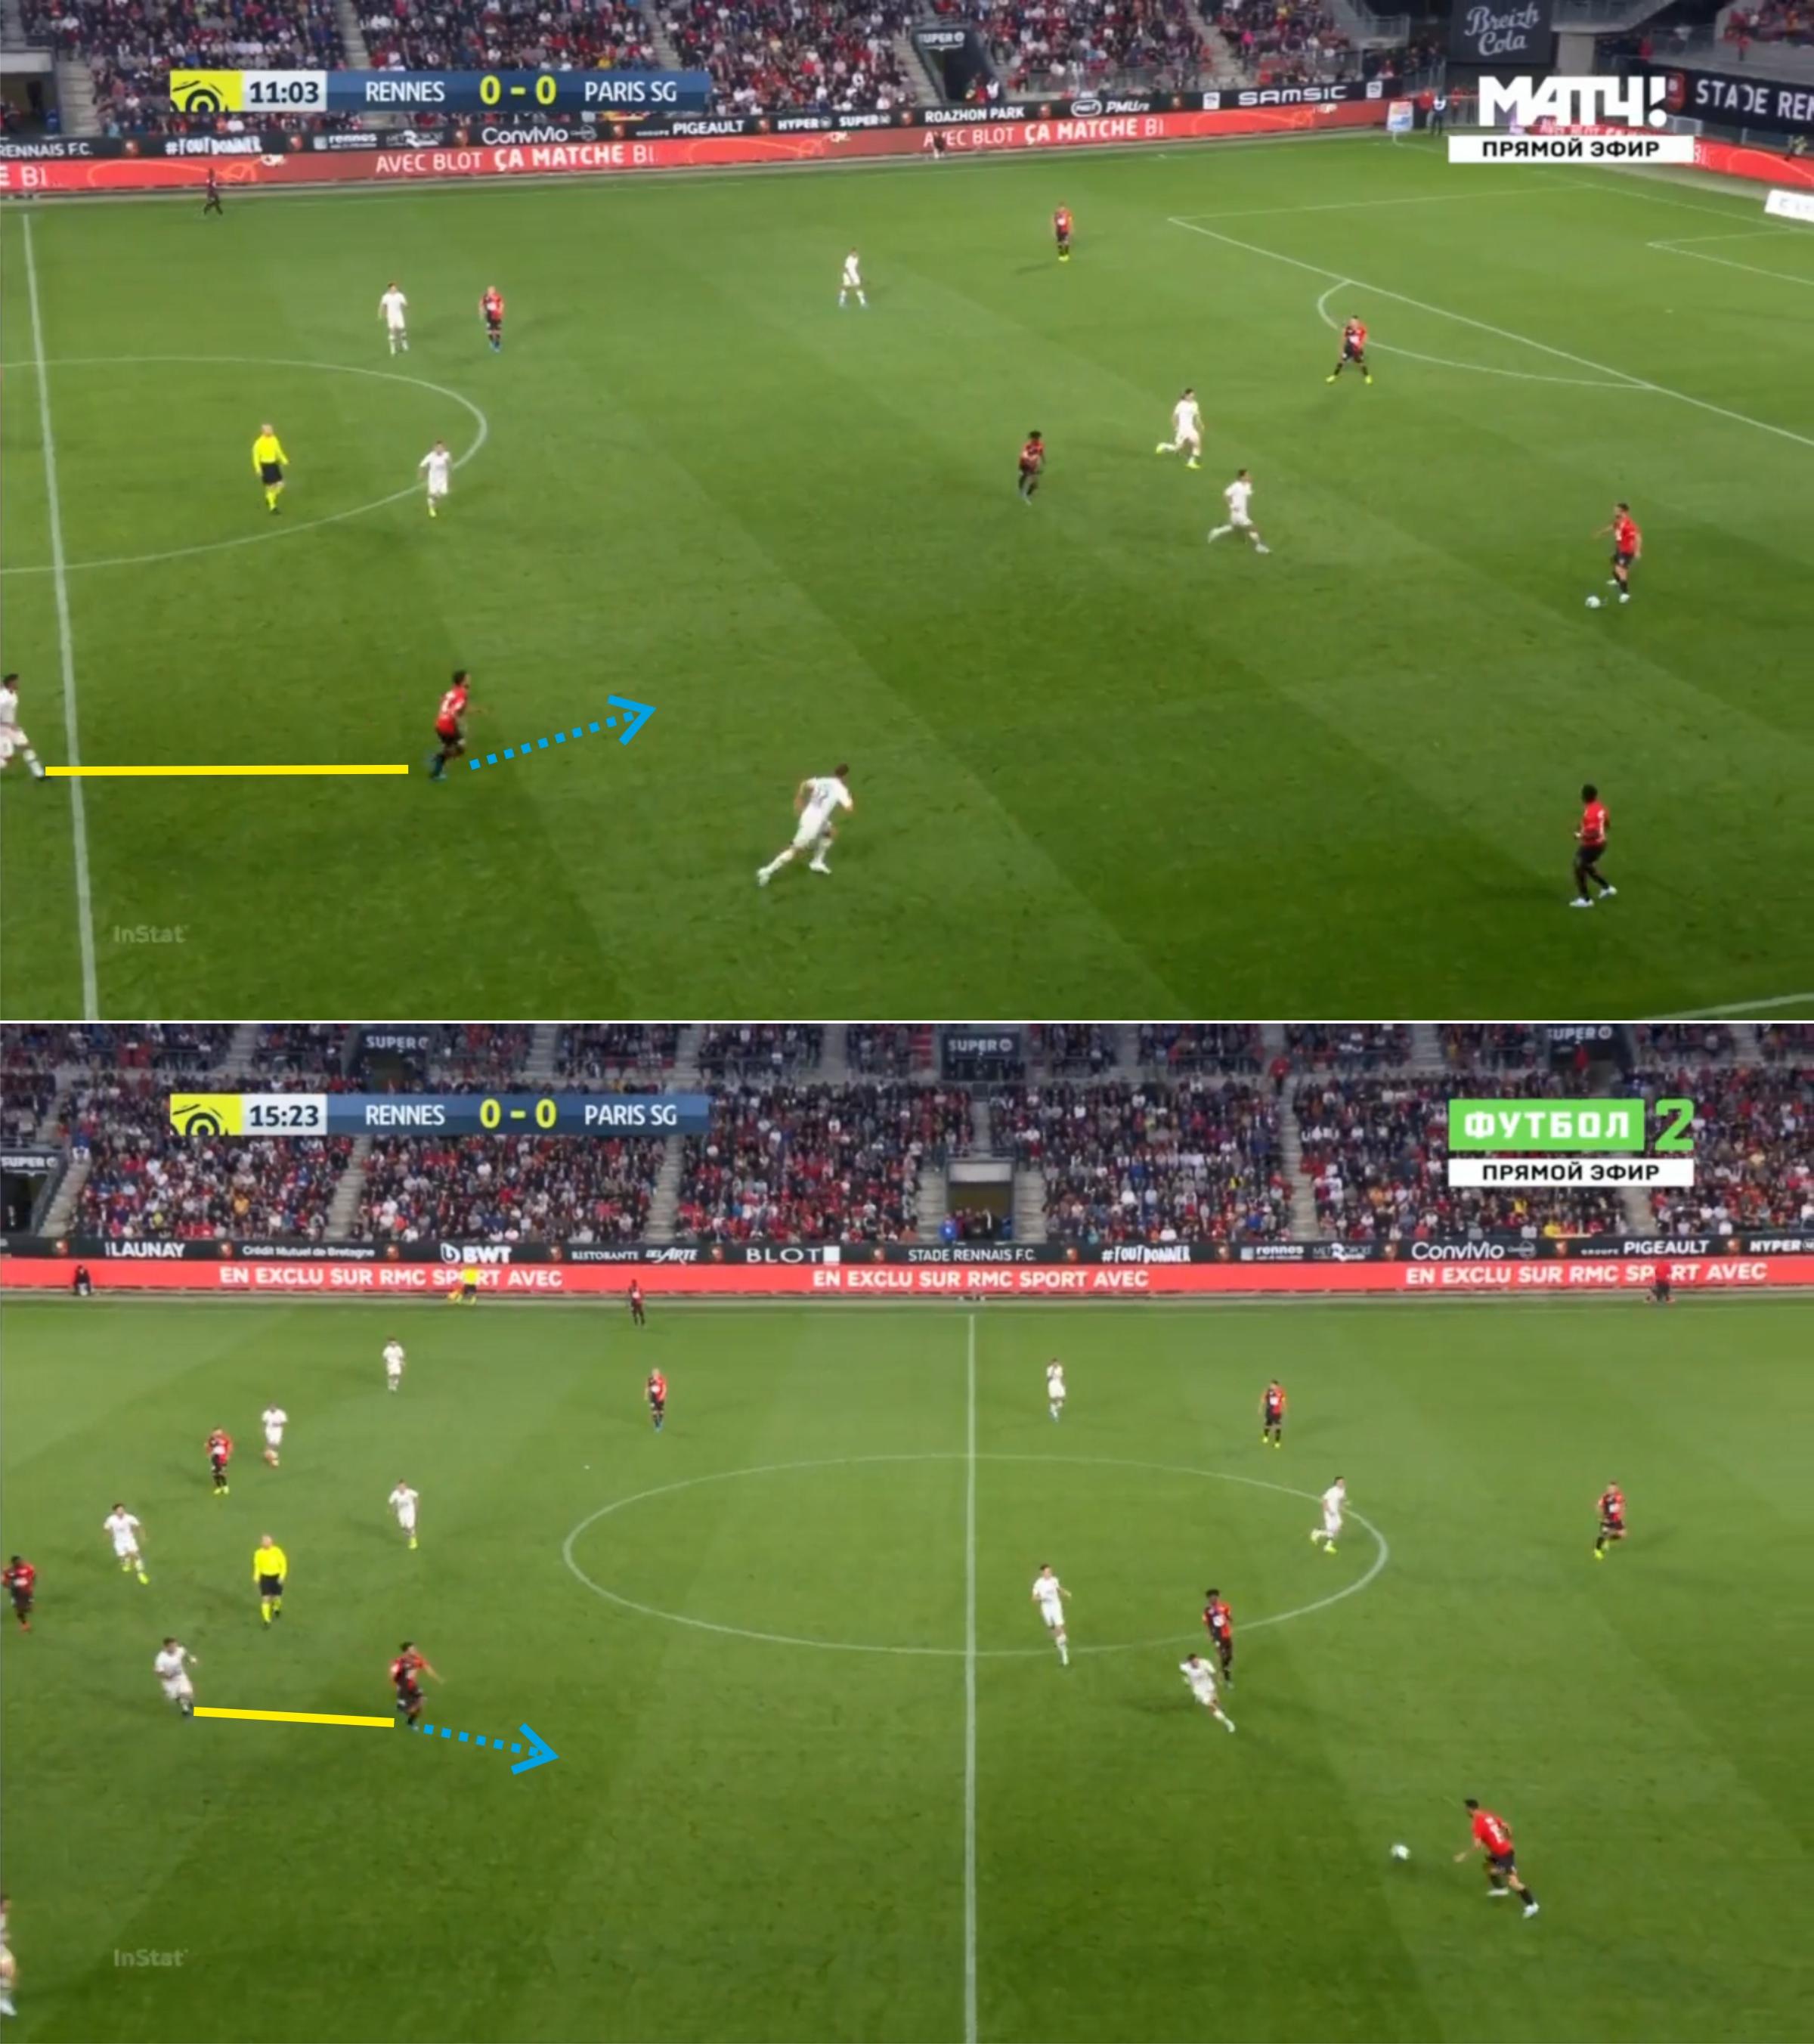 Ligue 1 2019/20: Rennes vs PSG - tactical analysis tactics